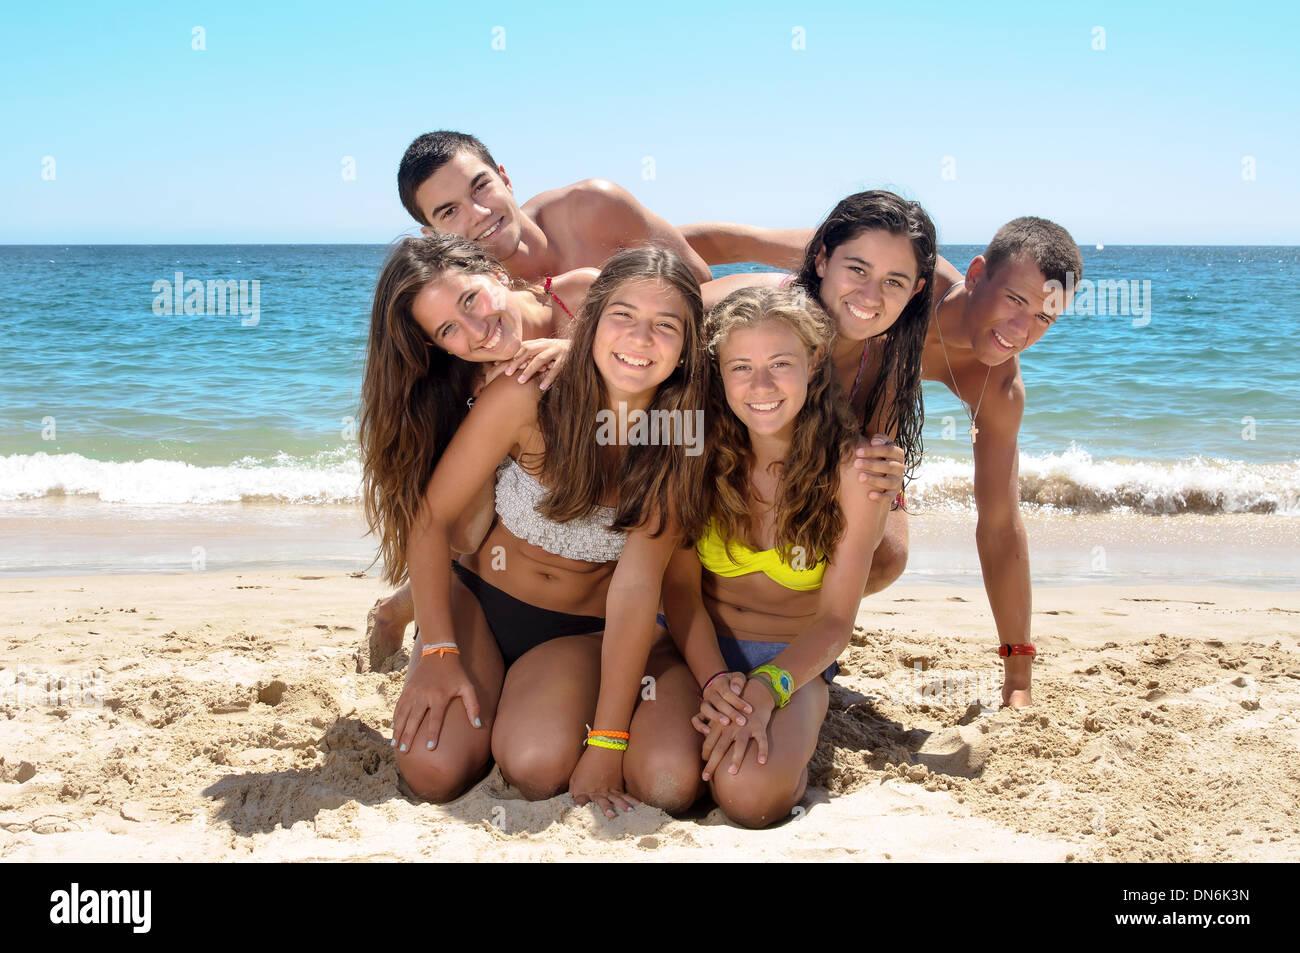 Beach teen insured by #15